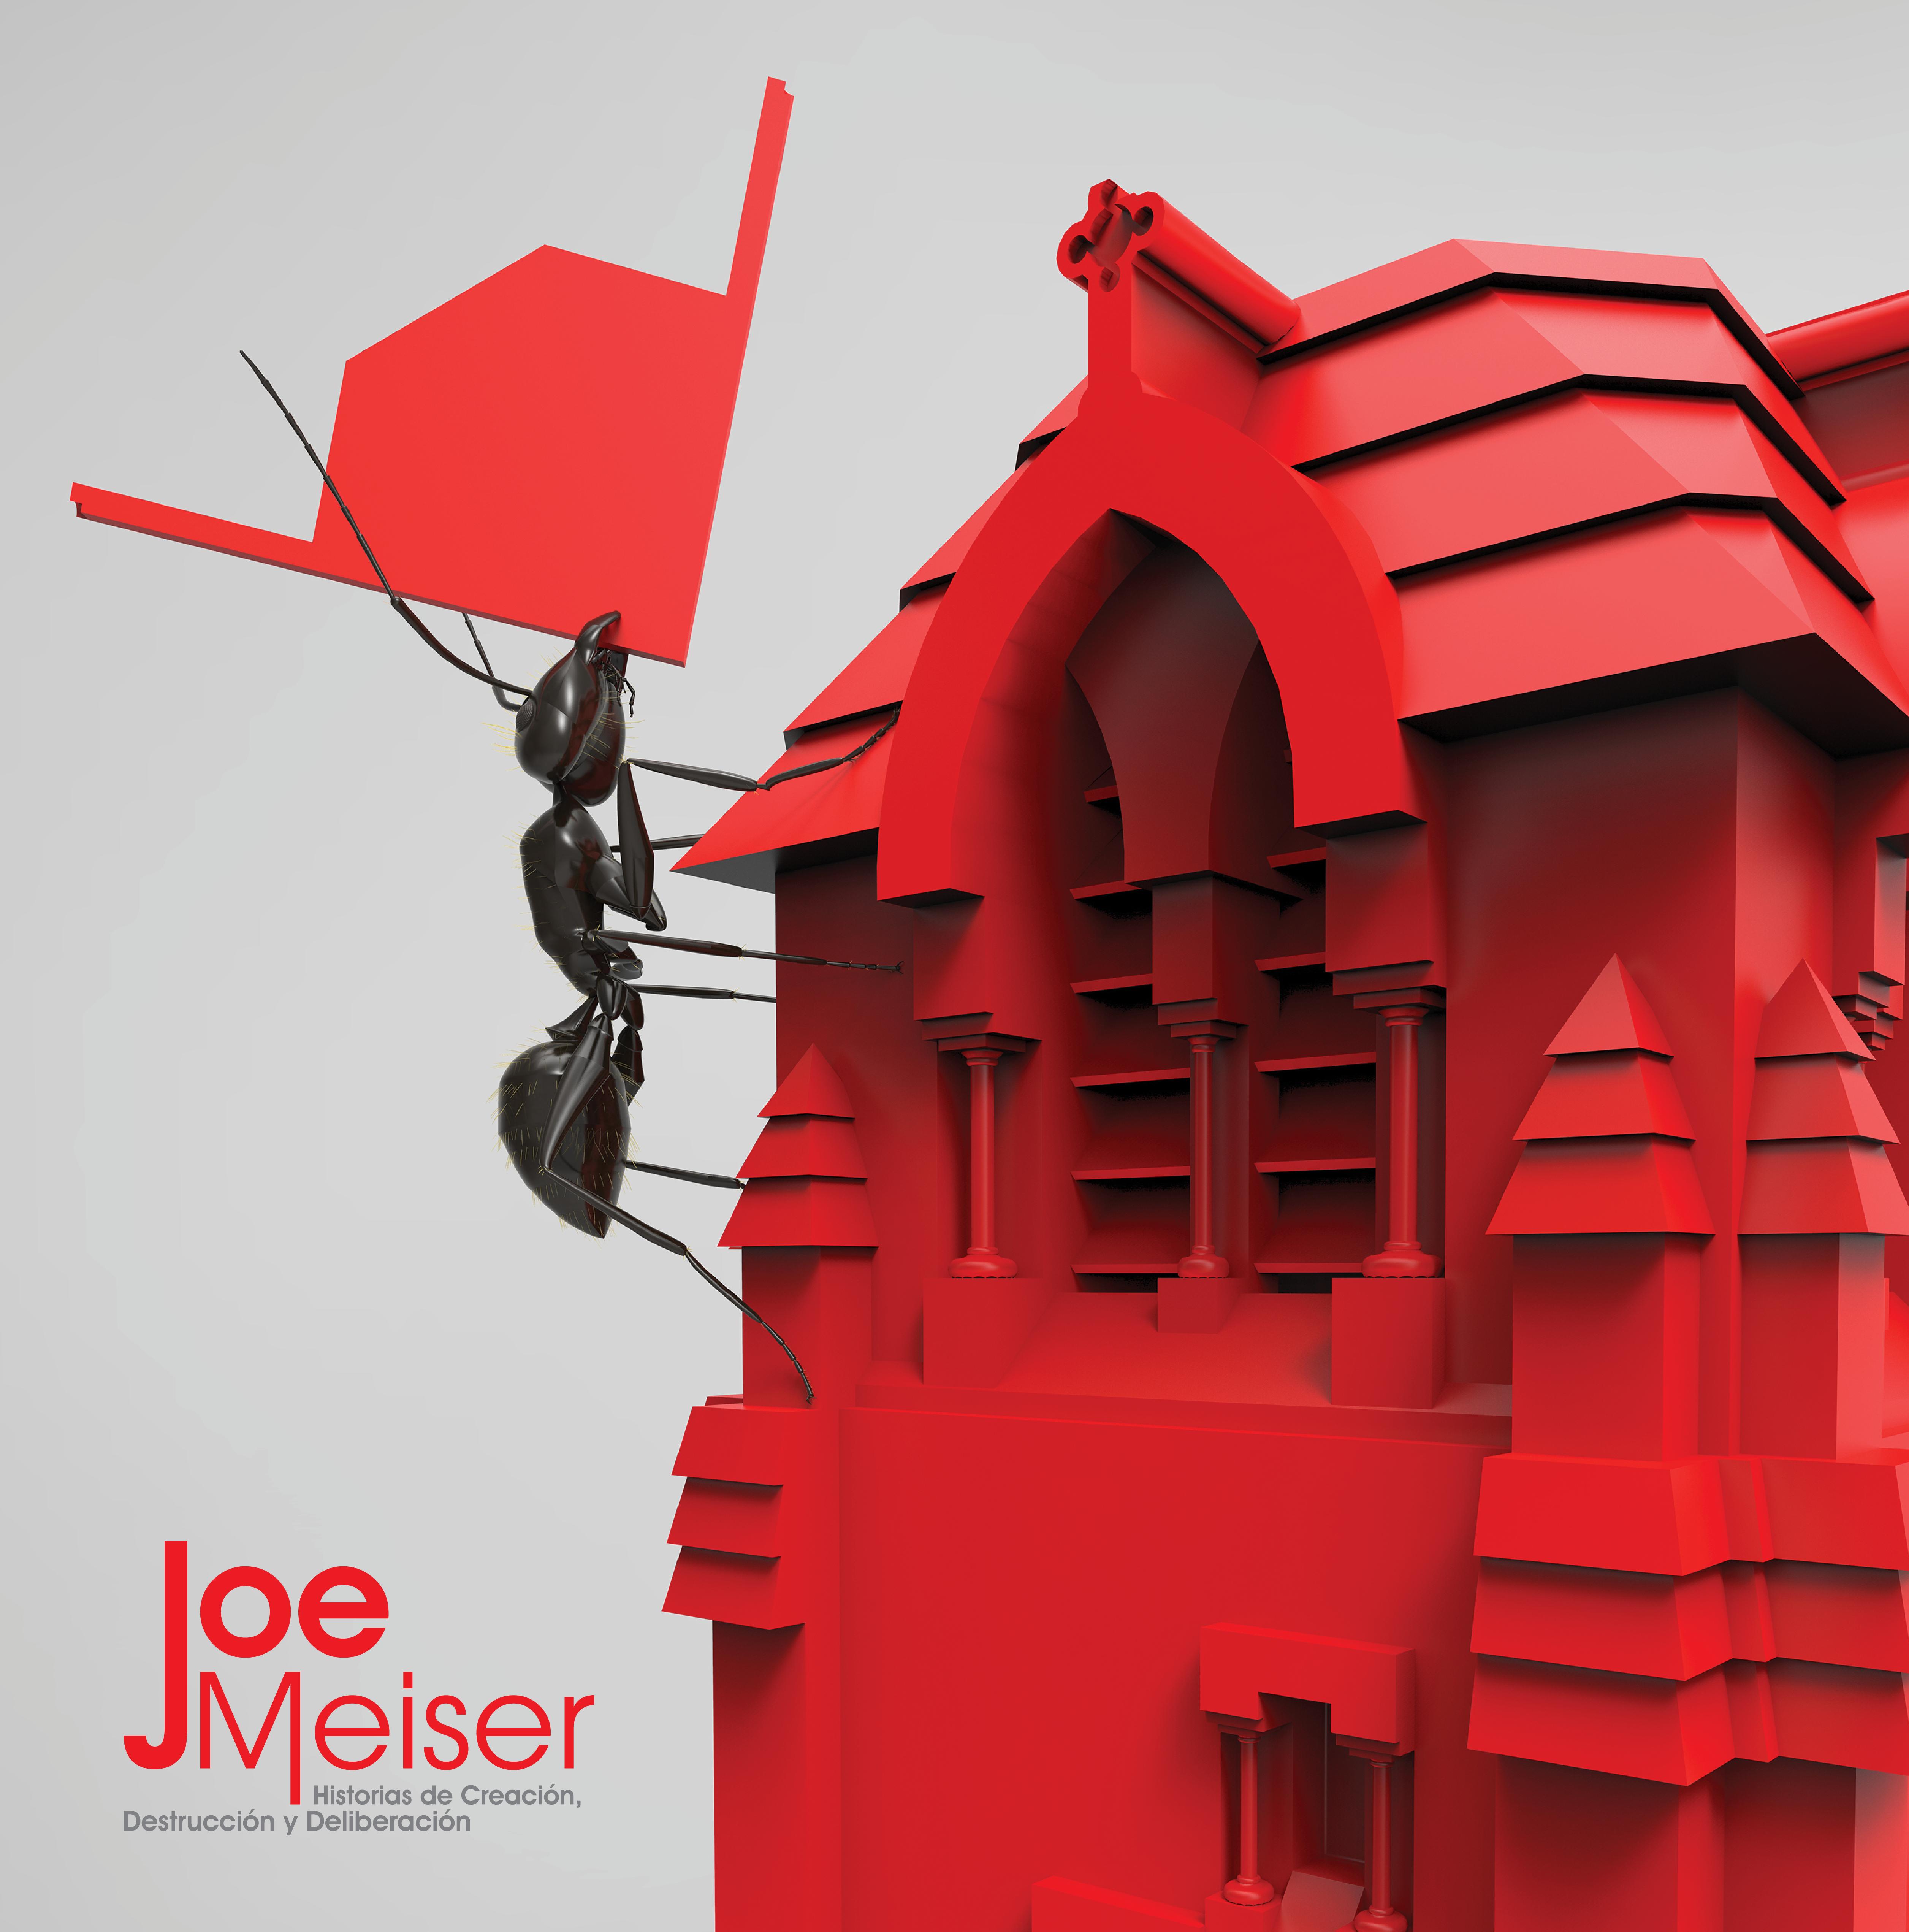 Joe Meiser